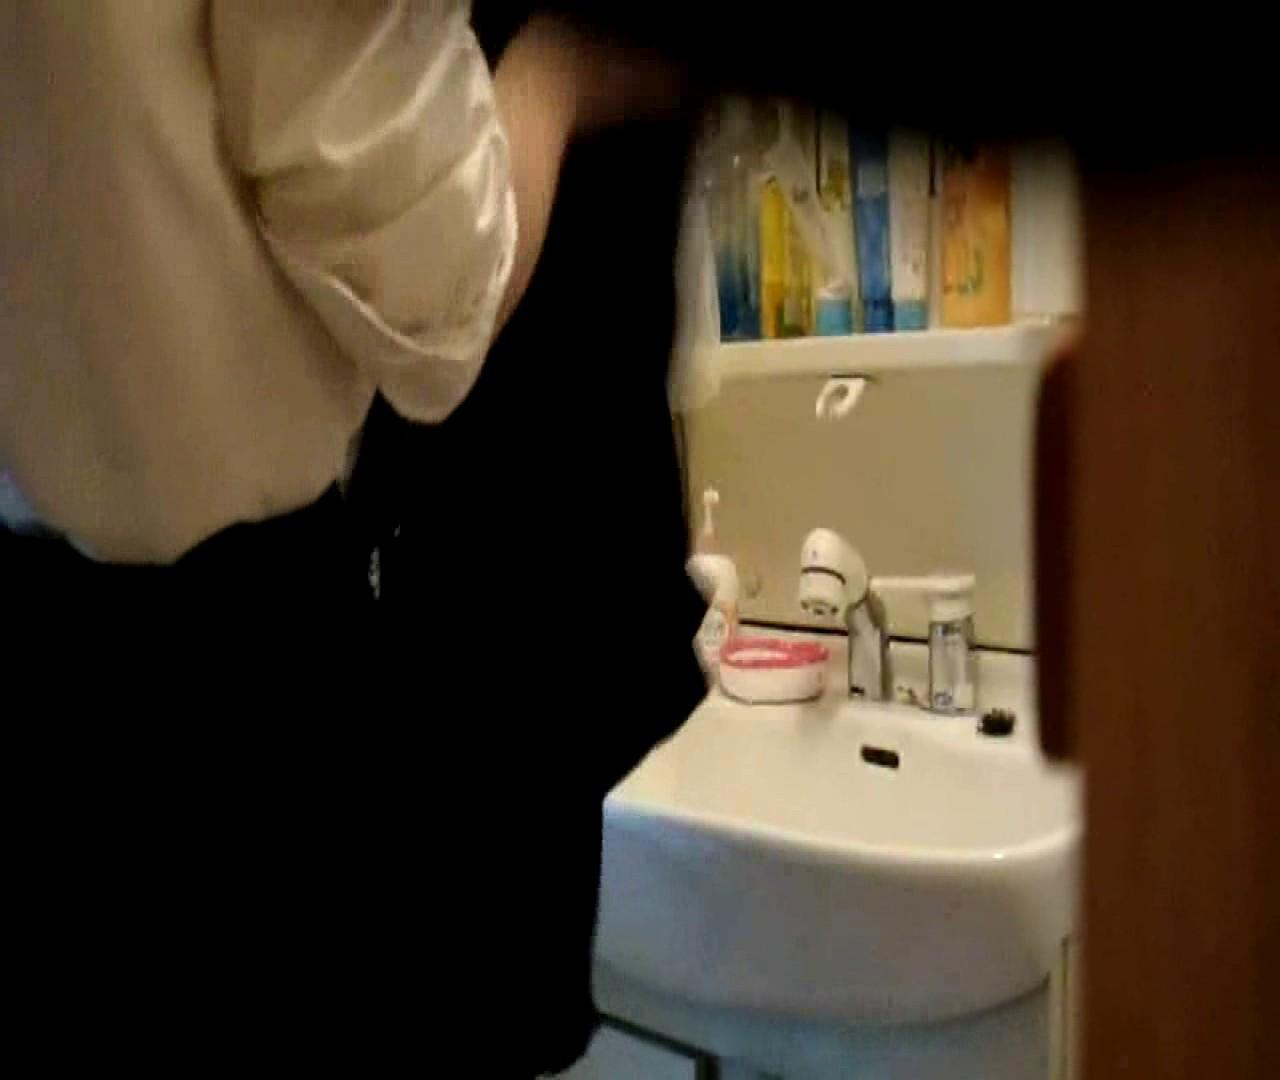 vol.5 まどかが帰宅後の洗顔後にブラを洗ってます。 ギャル達 | 民家  112枚 93